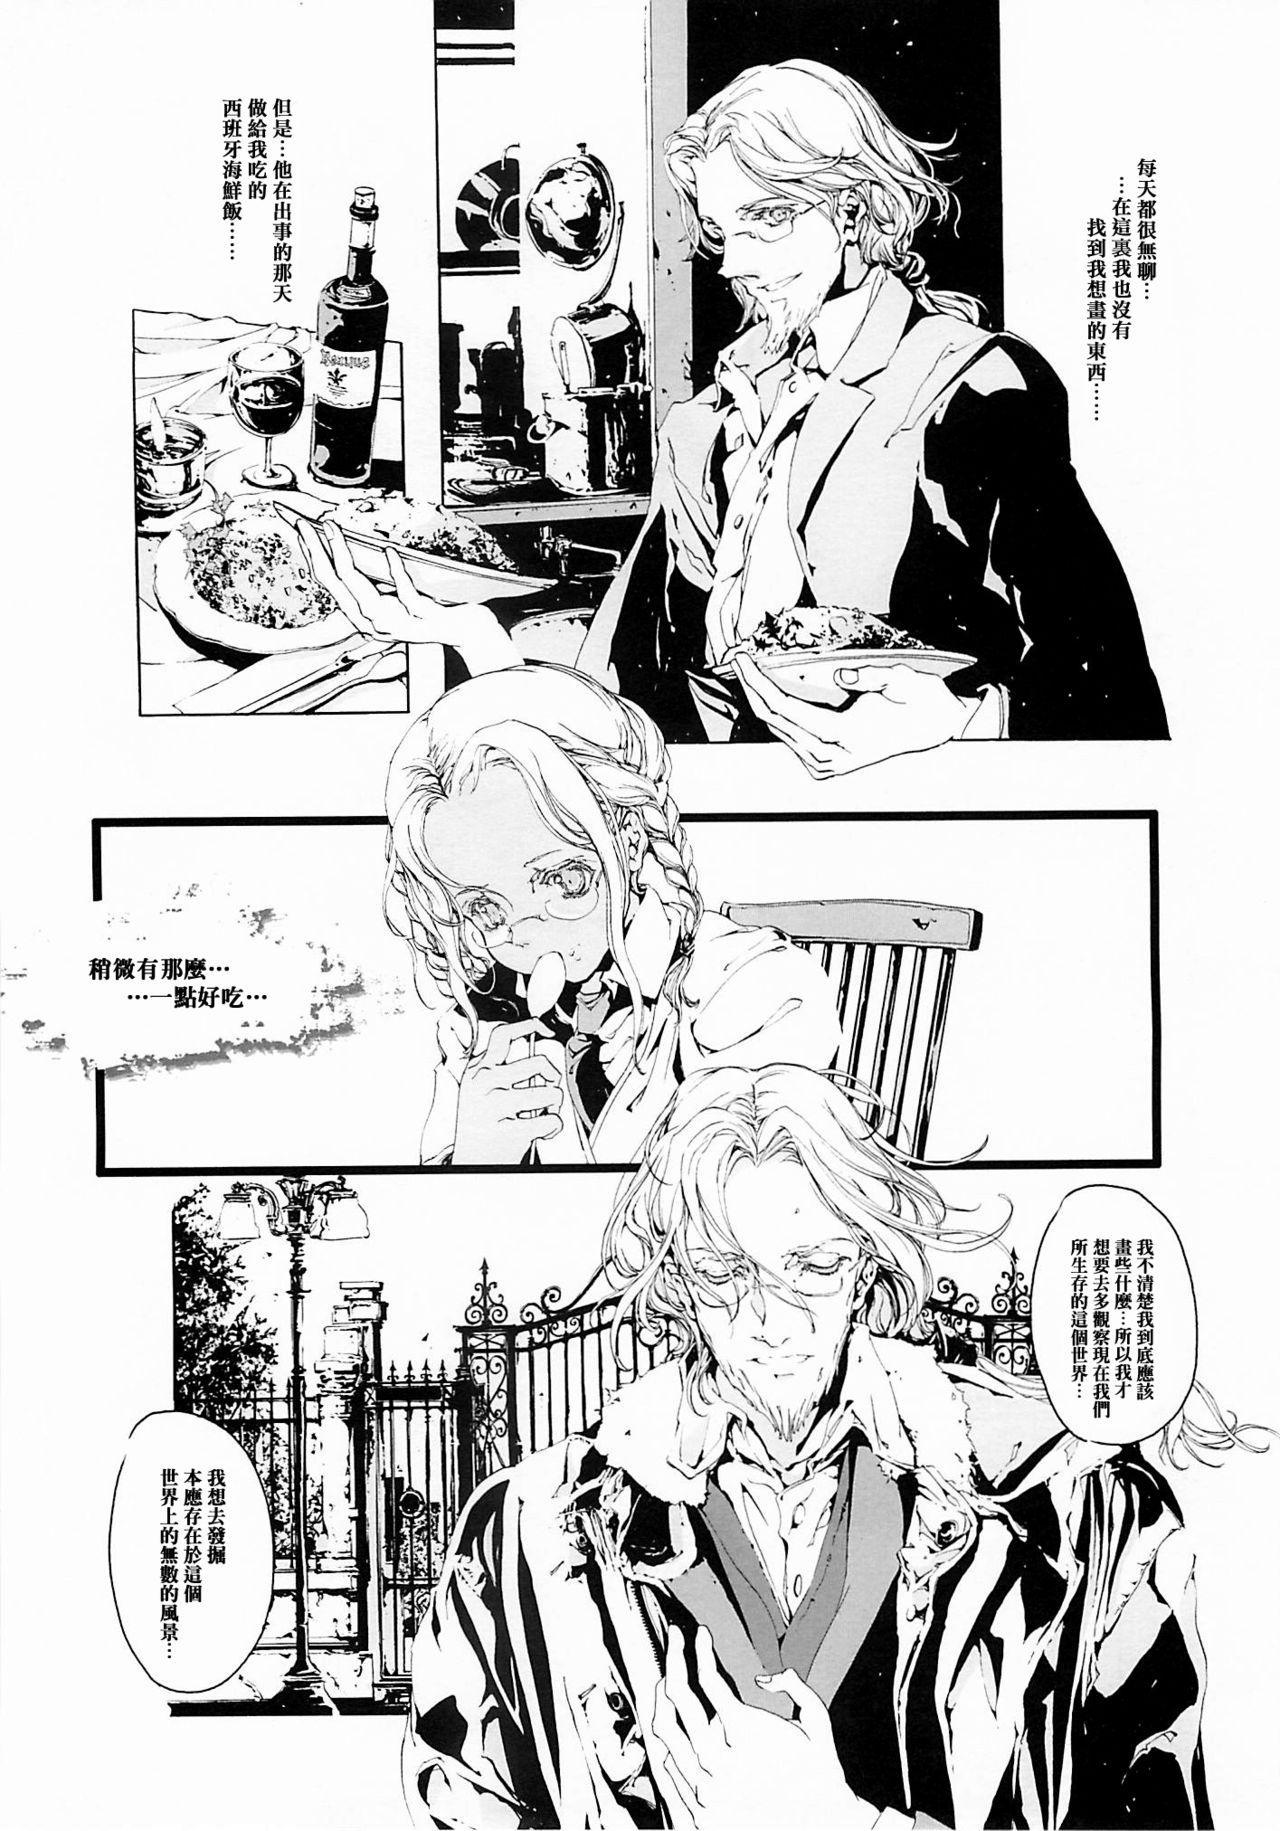 (CR37) [70 Nenshiki Yuukyuu Kikan (Endou Okito)] ORGAN-Tino  01-02[Chinese] [拾荒者汉化组] [Incomplete] 33